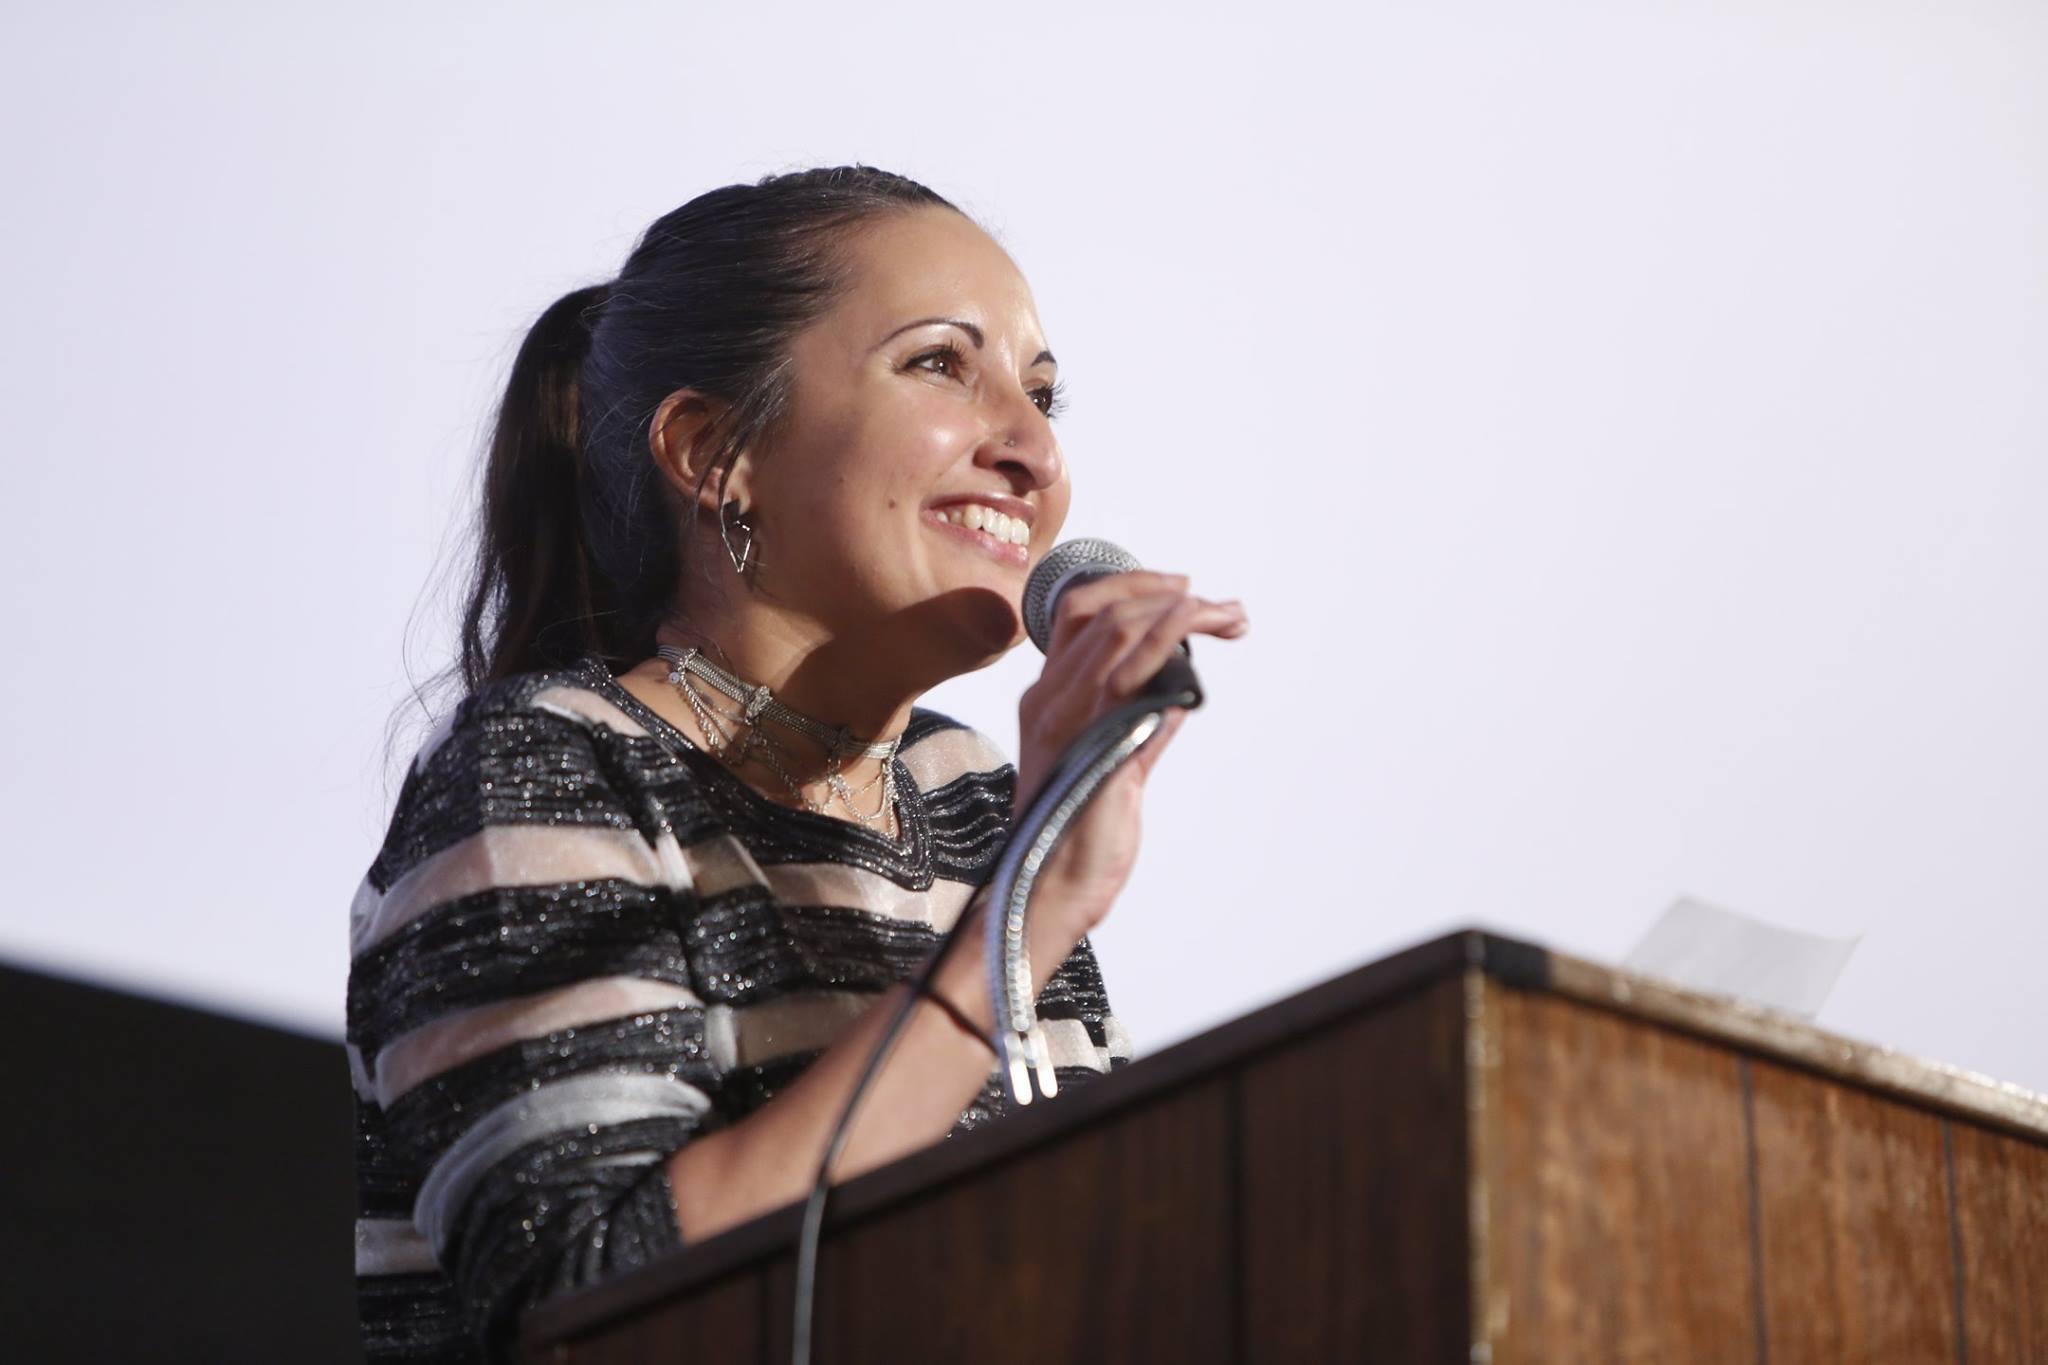 Lucy Mukerjee